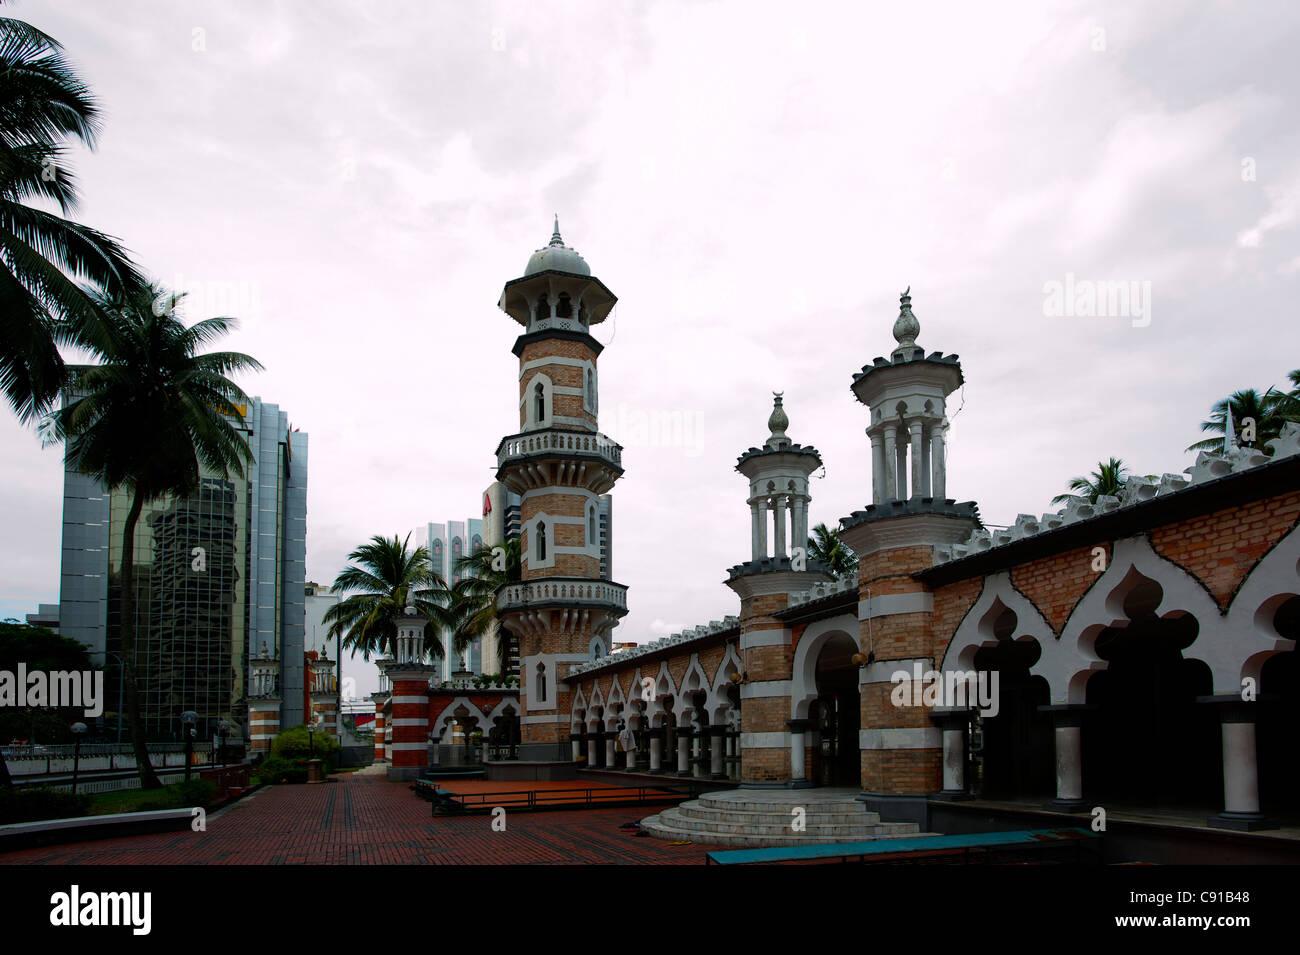 Masjid Jamek mosque under clouded sky, Kuala Lumpur, Malaysia, Asia - Stock Image